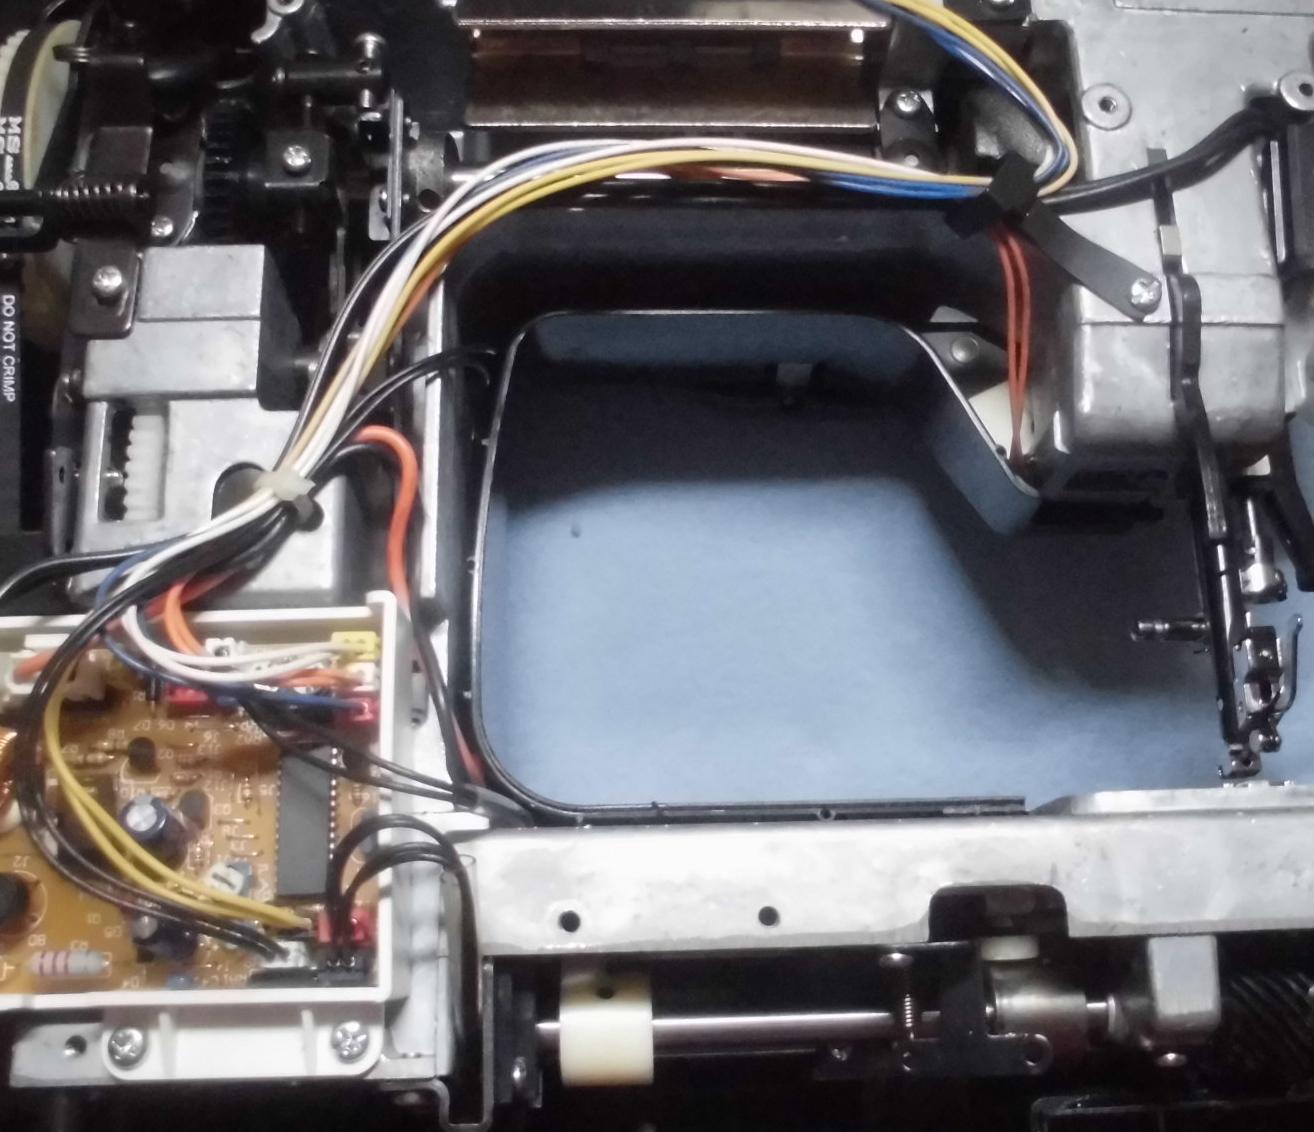 MS-2300DXの分解オーバーホールメンテナンス|シンガーミシン